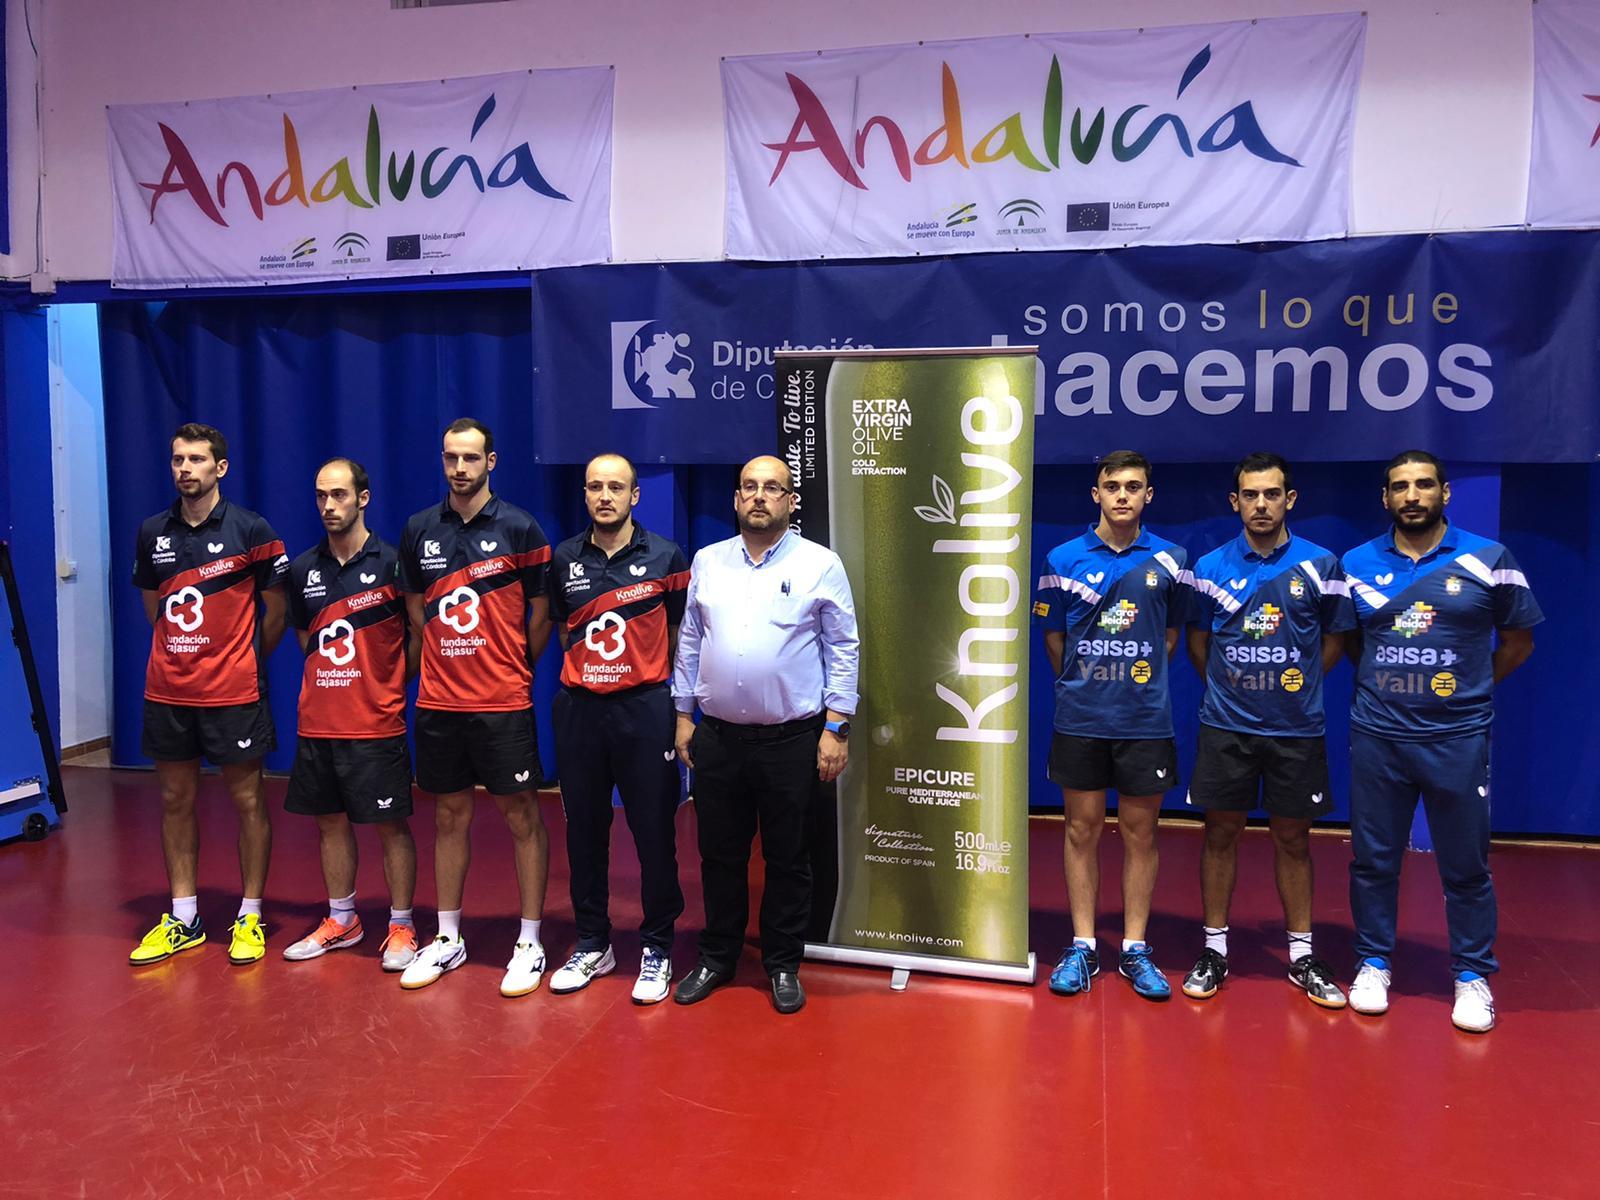 Derrota de l'ASISA Borges Vall al camp del Cajasur Priego per 4-1